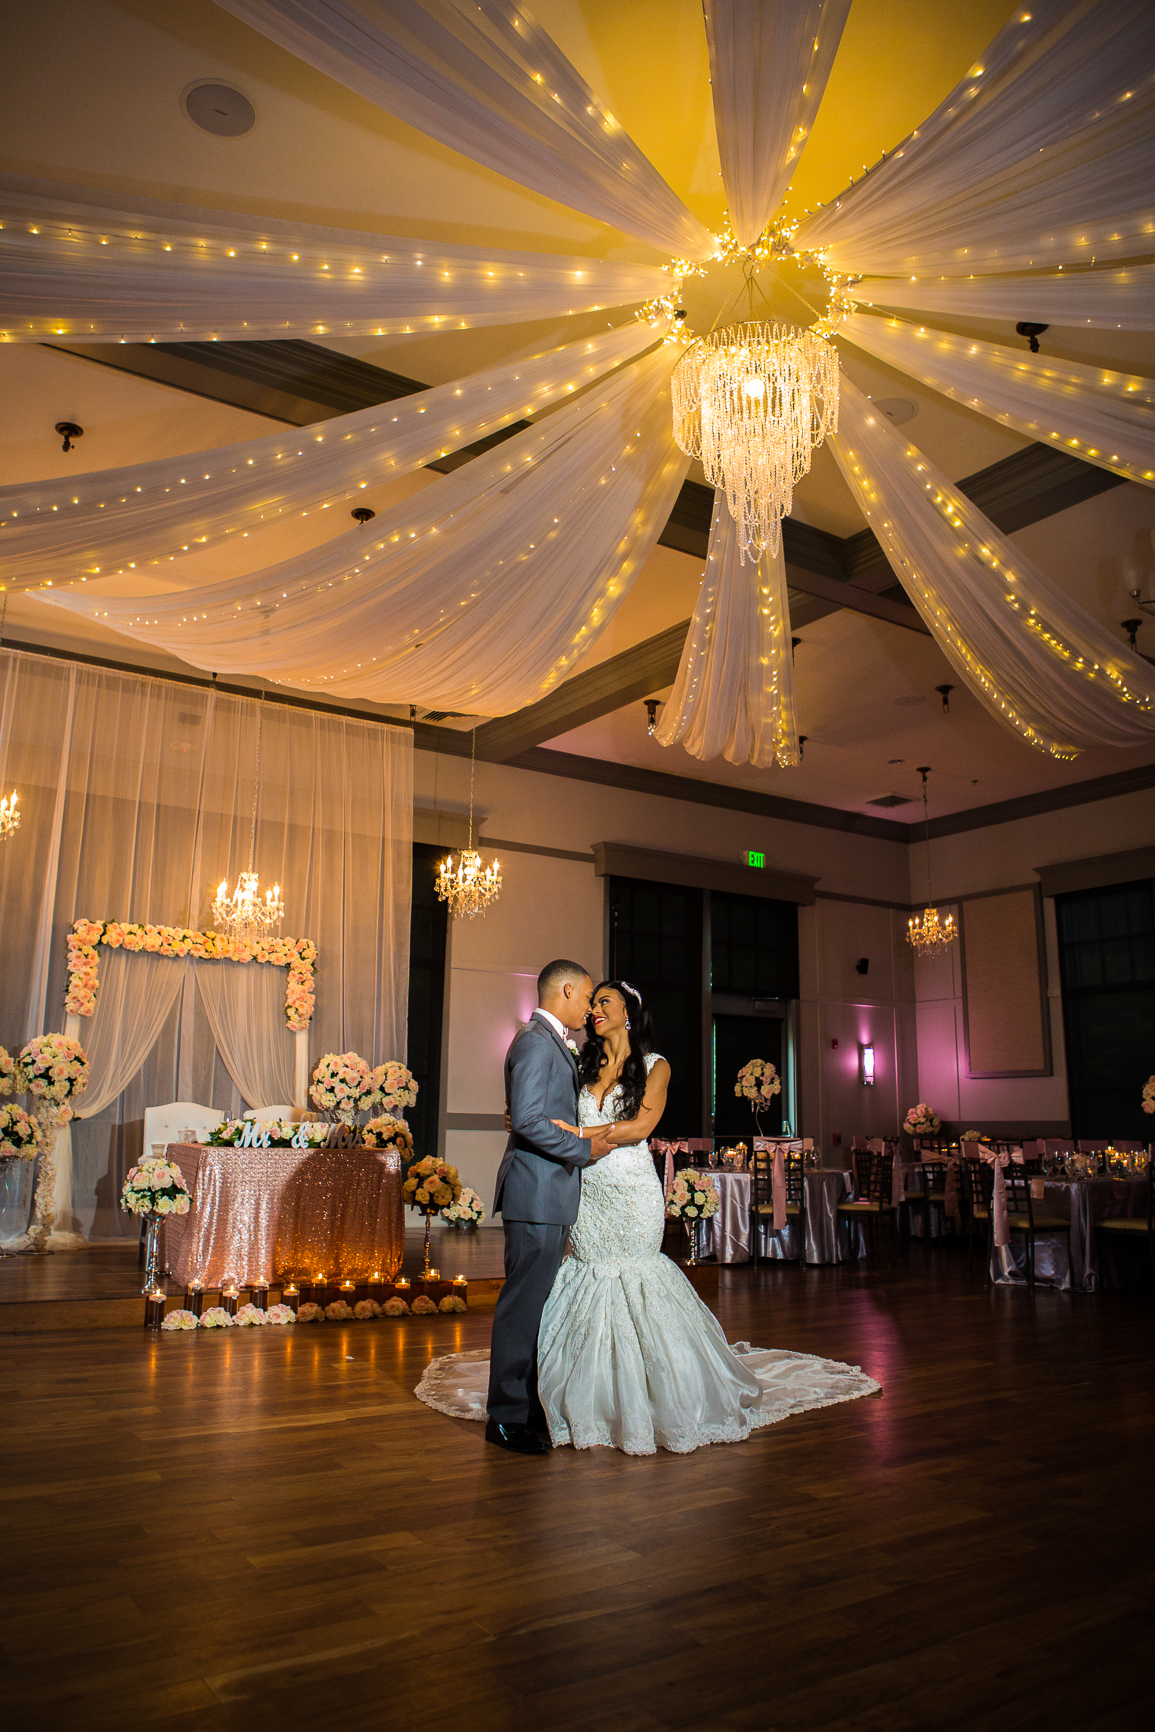 Noah's Morrisville wedding venue photographer - 101 studio llc -20.jpg